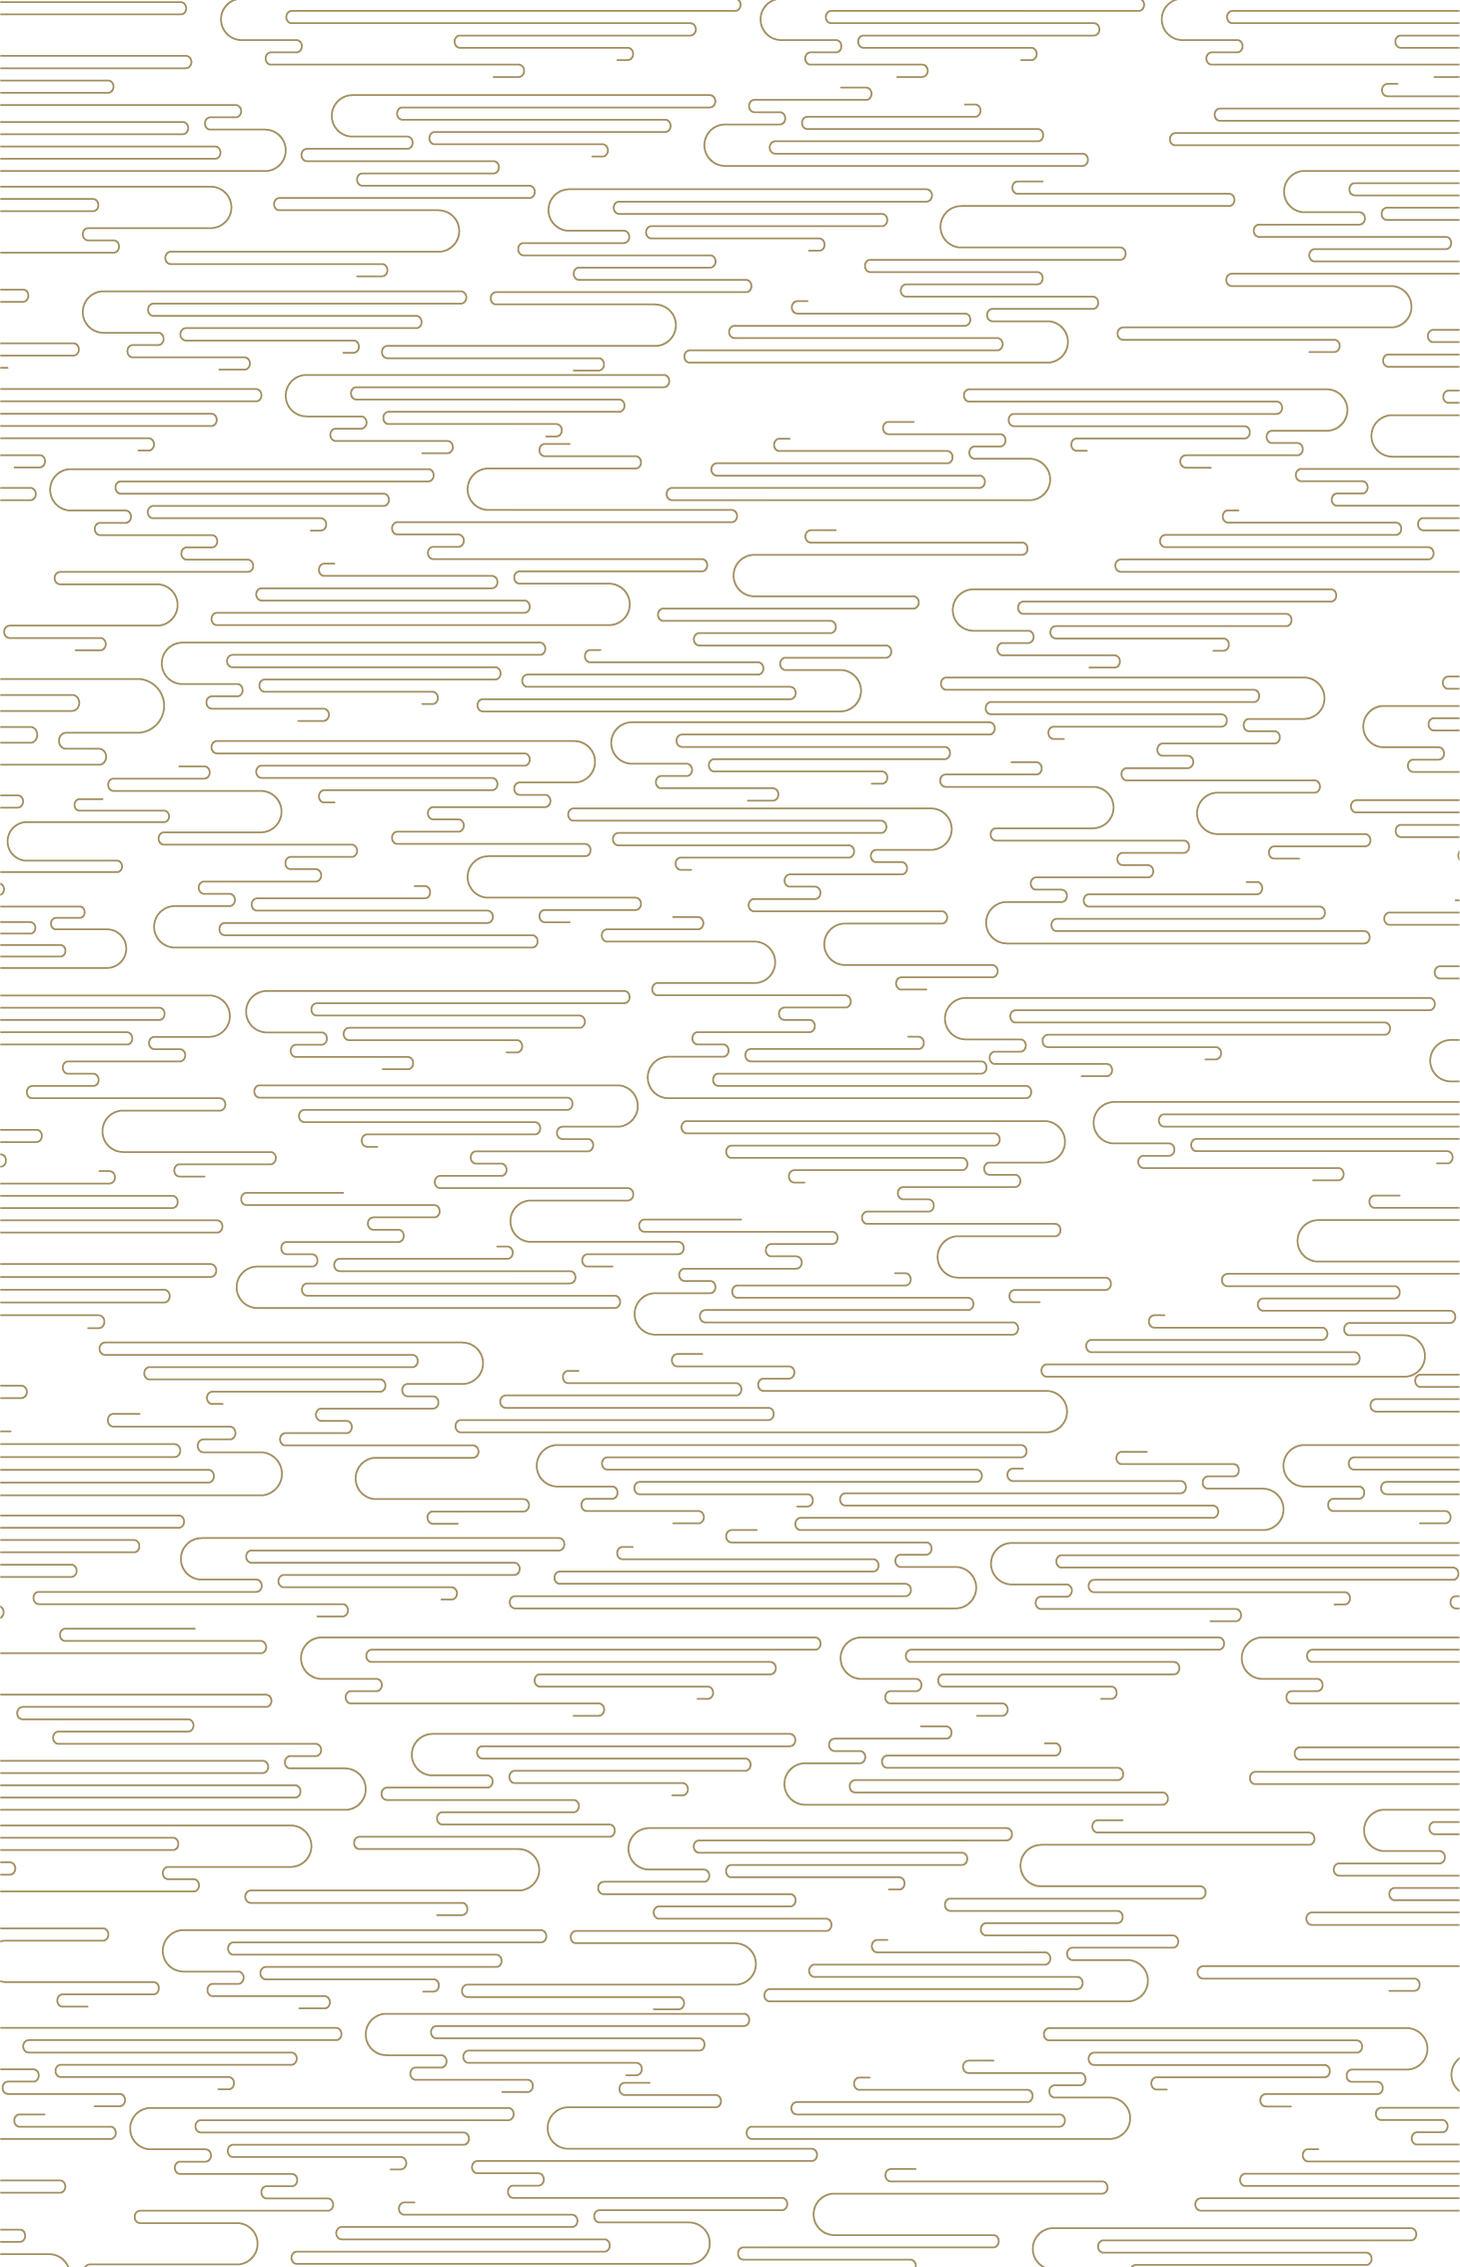 Motomotoyama_Pattern_01.jpg